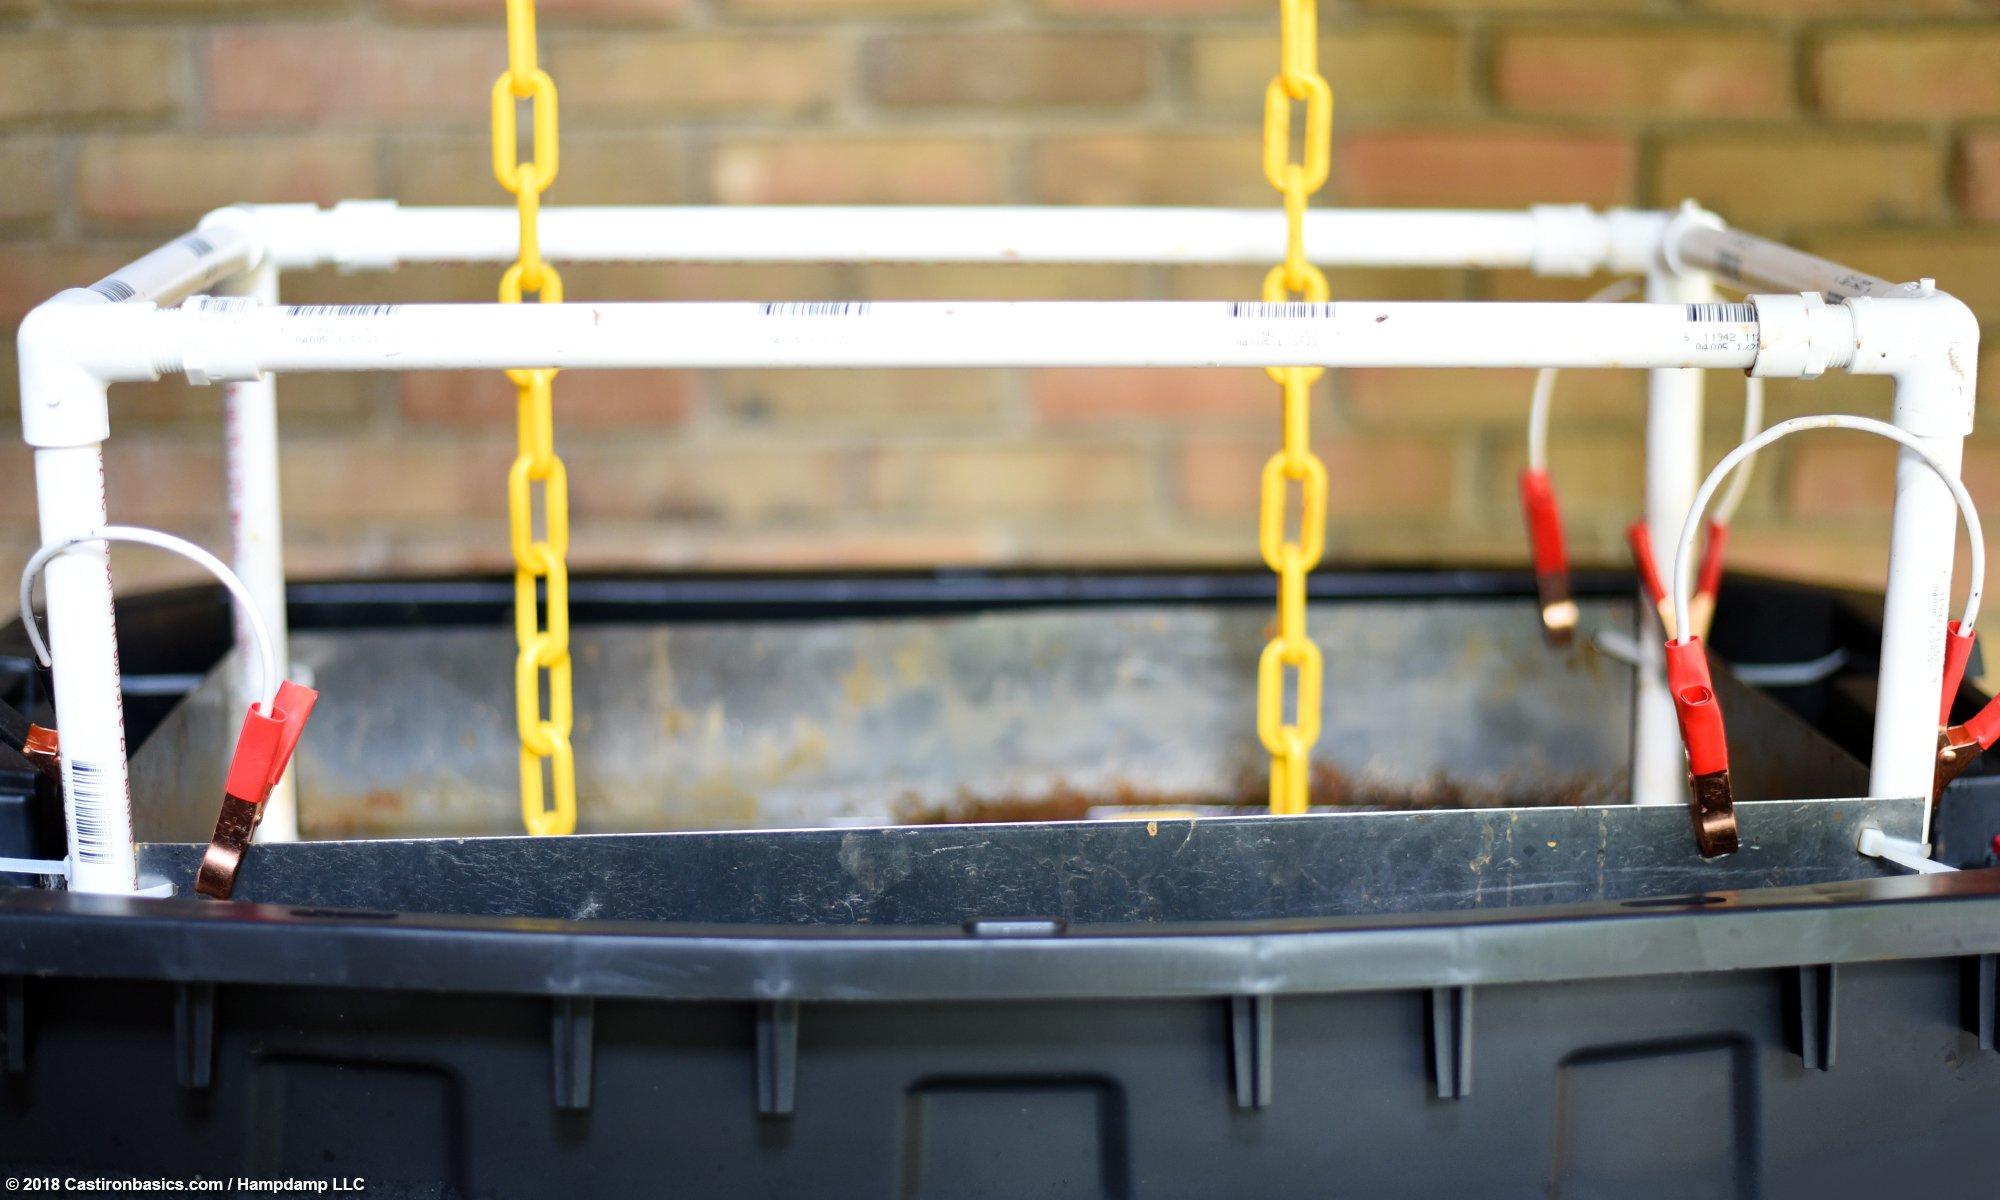 Rust Removal: Electrolysis Tank